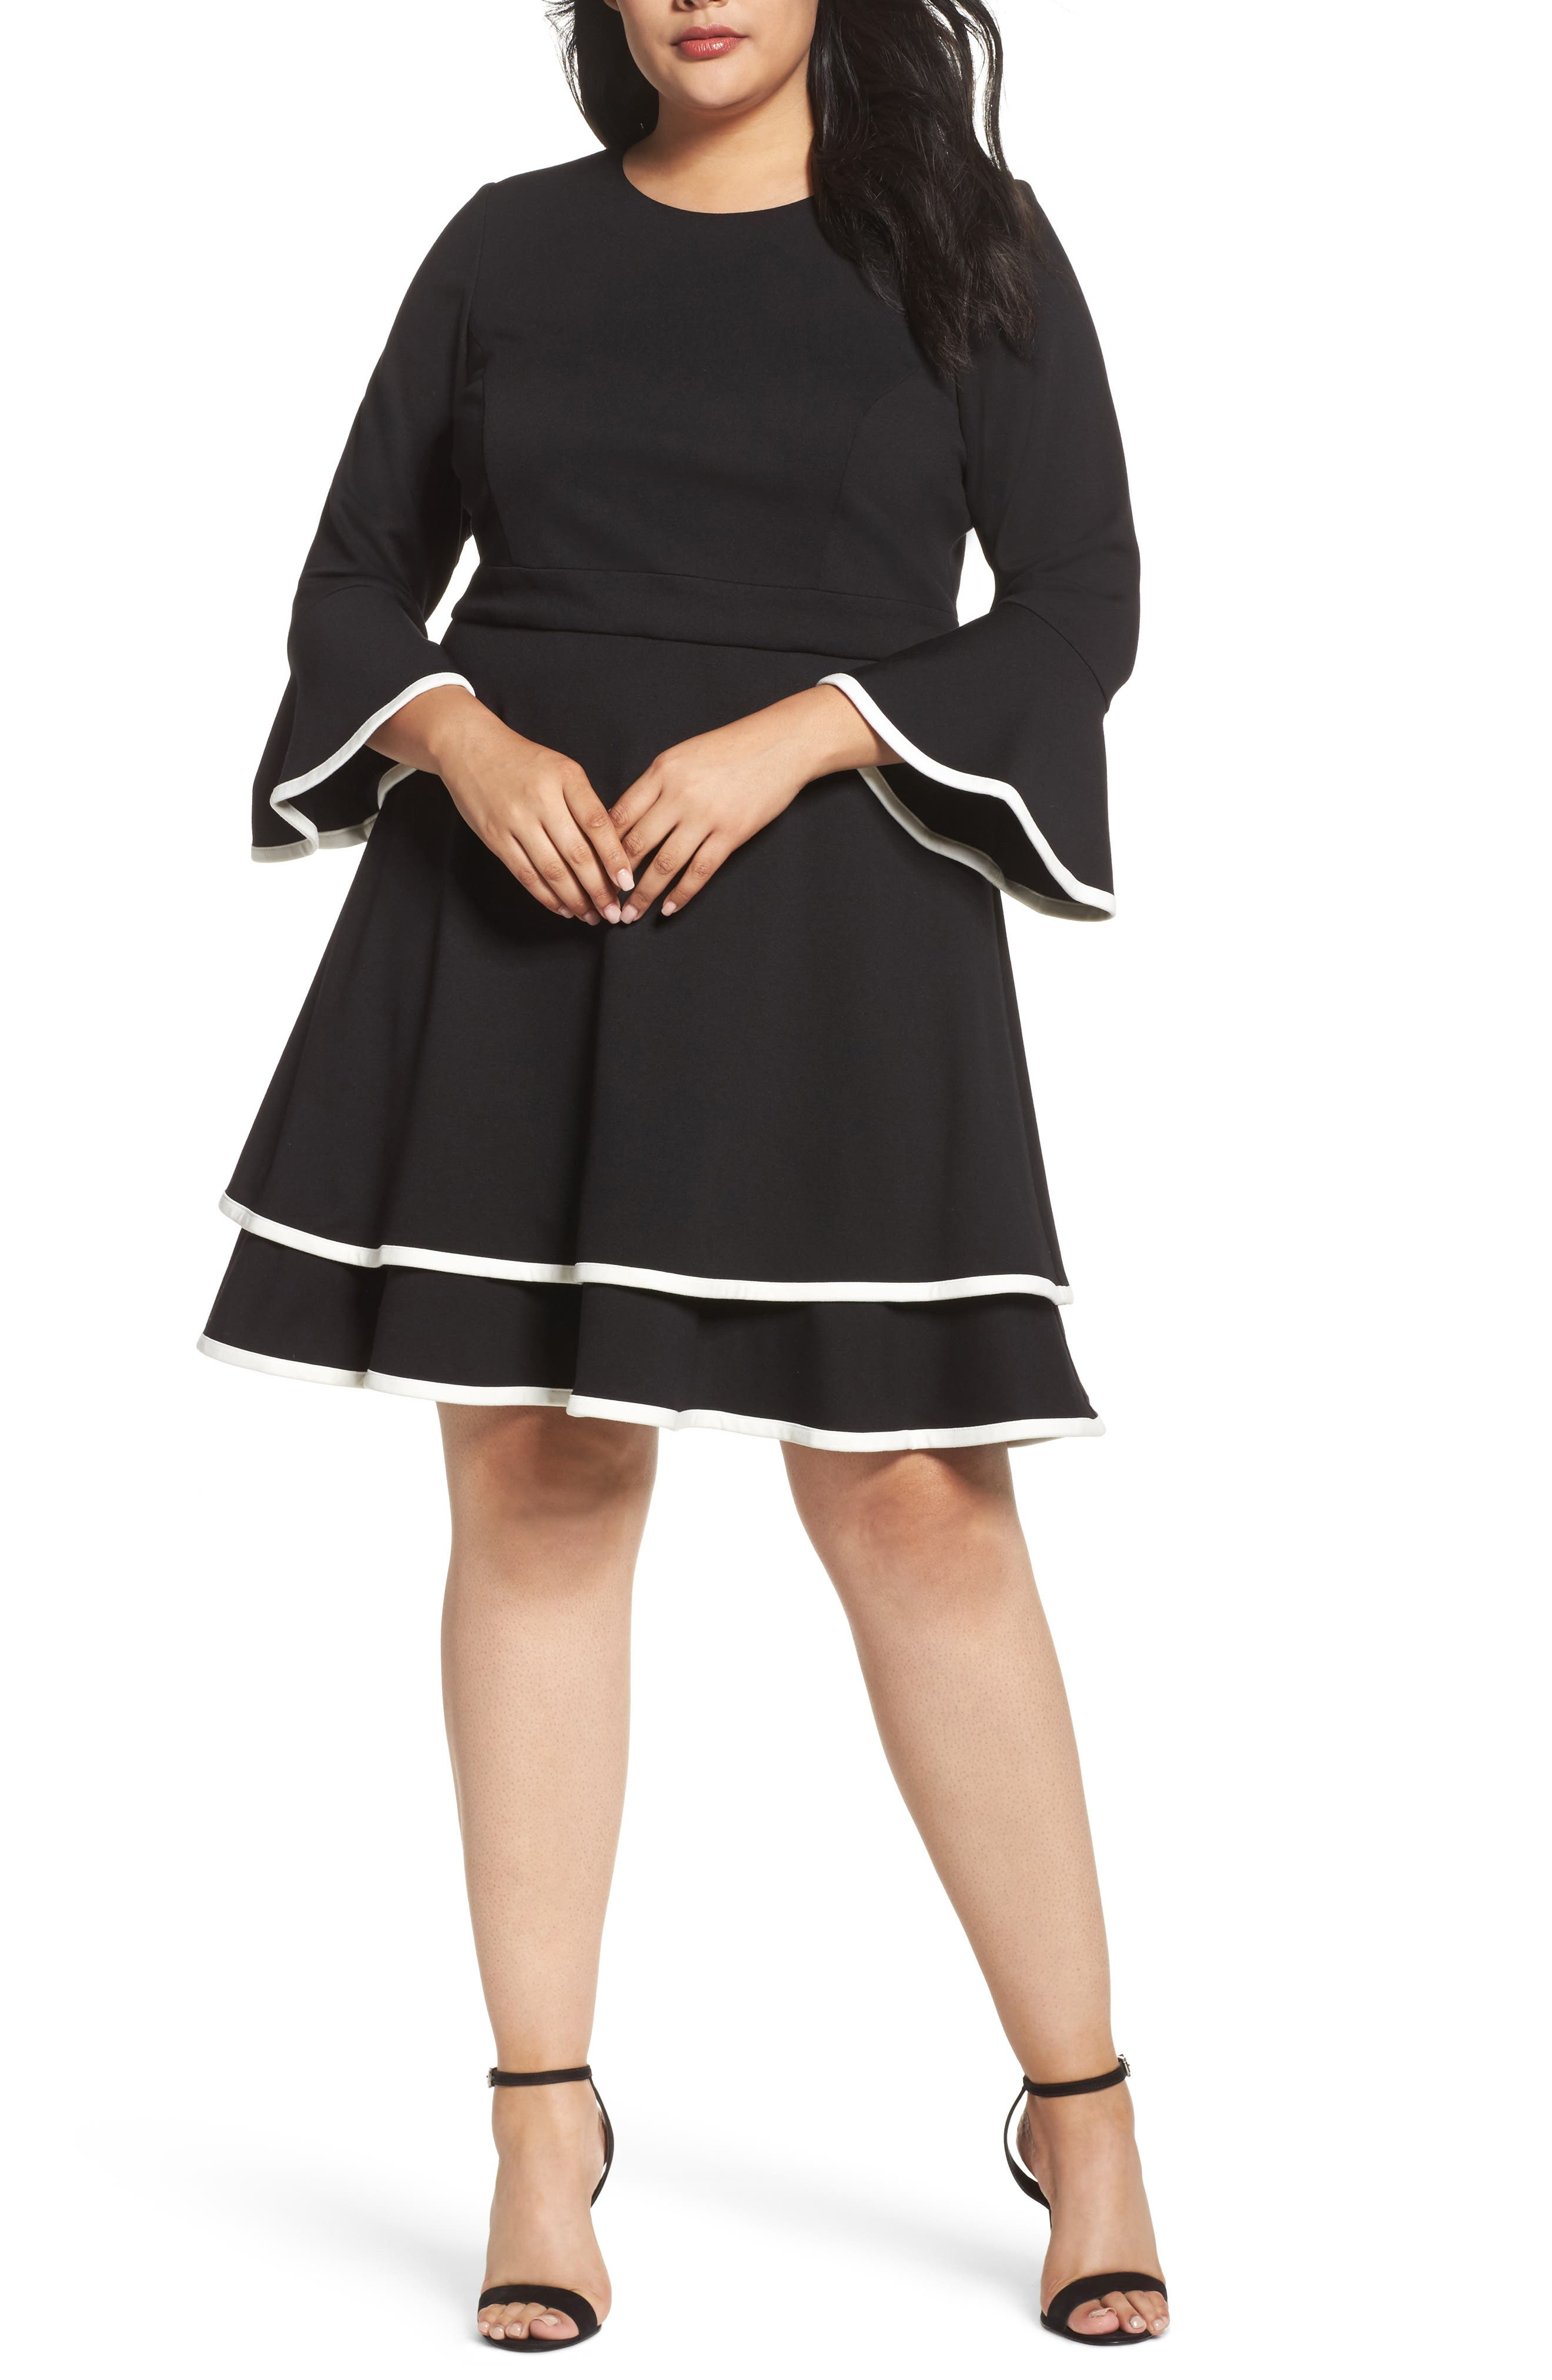 Bell Sleeve Contrast Trim Fit & Flare Dress,                         Main,                         color, BLACK/ IVORY